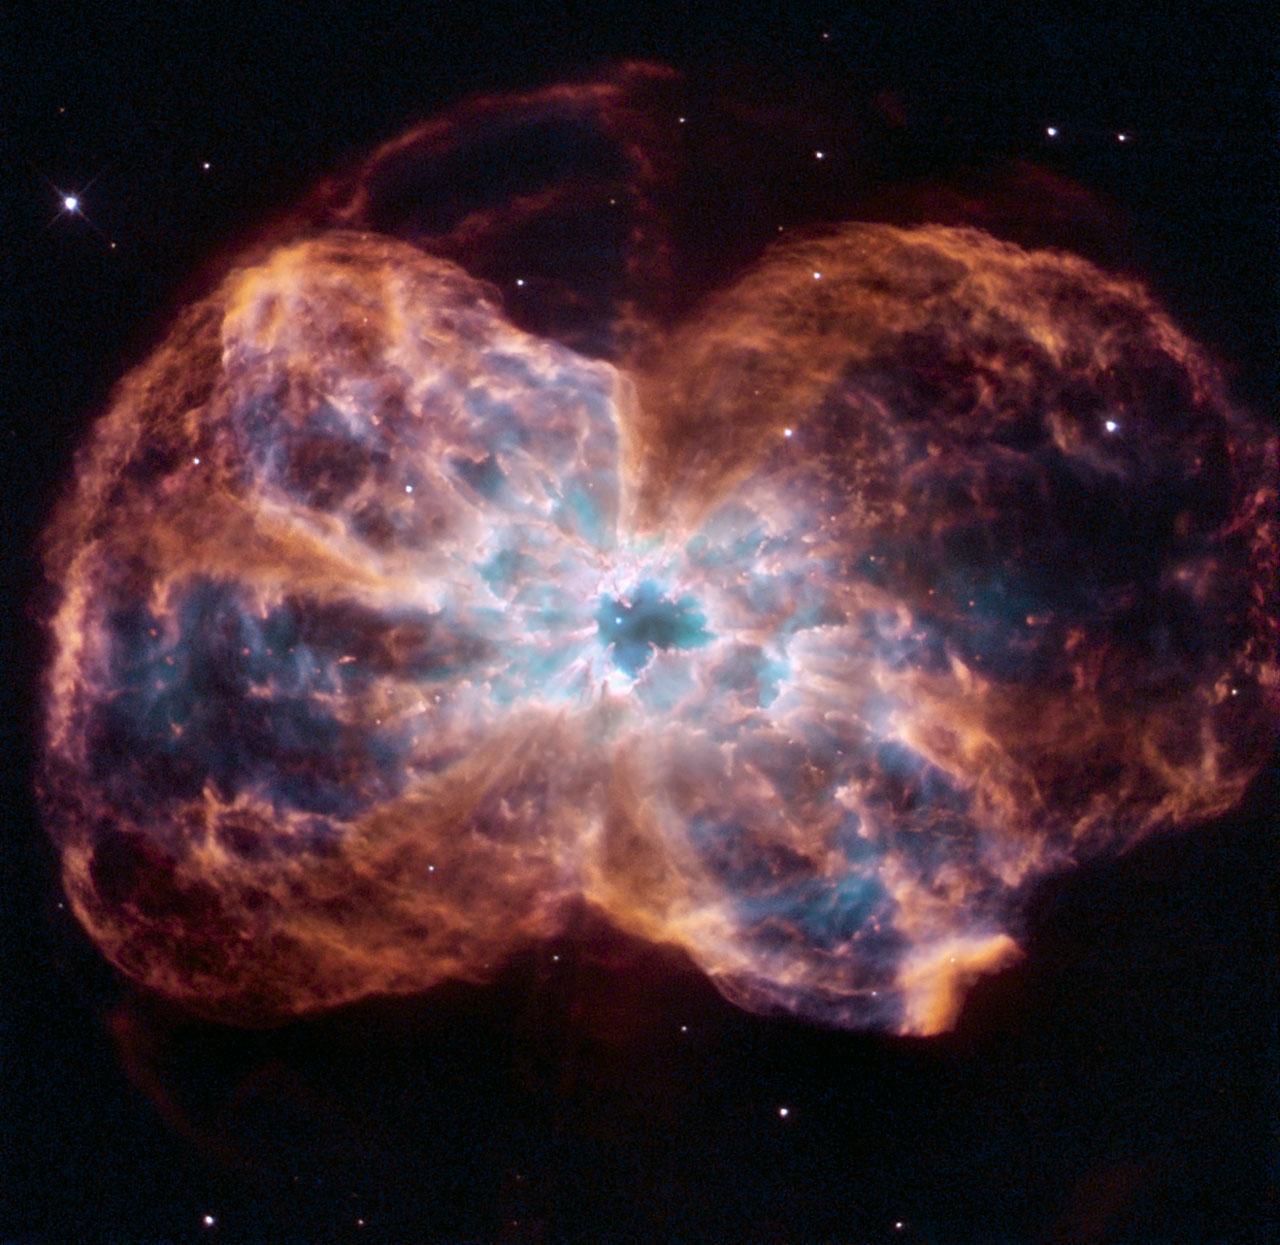 Credits: NASA, ESA, and K. Noll (STScI), Acknowledgment: The Hubble Heritage Team (STScI/AURA)